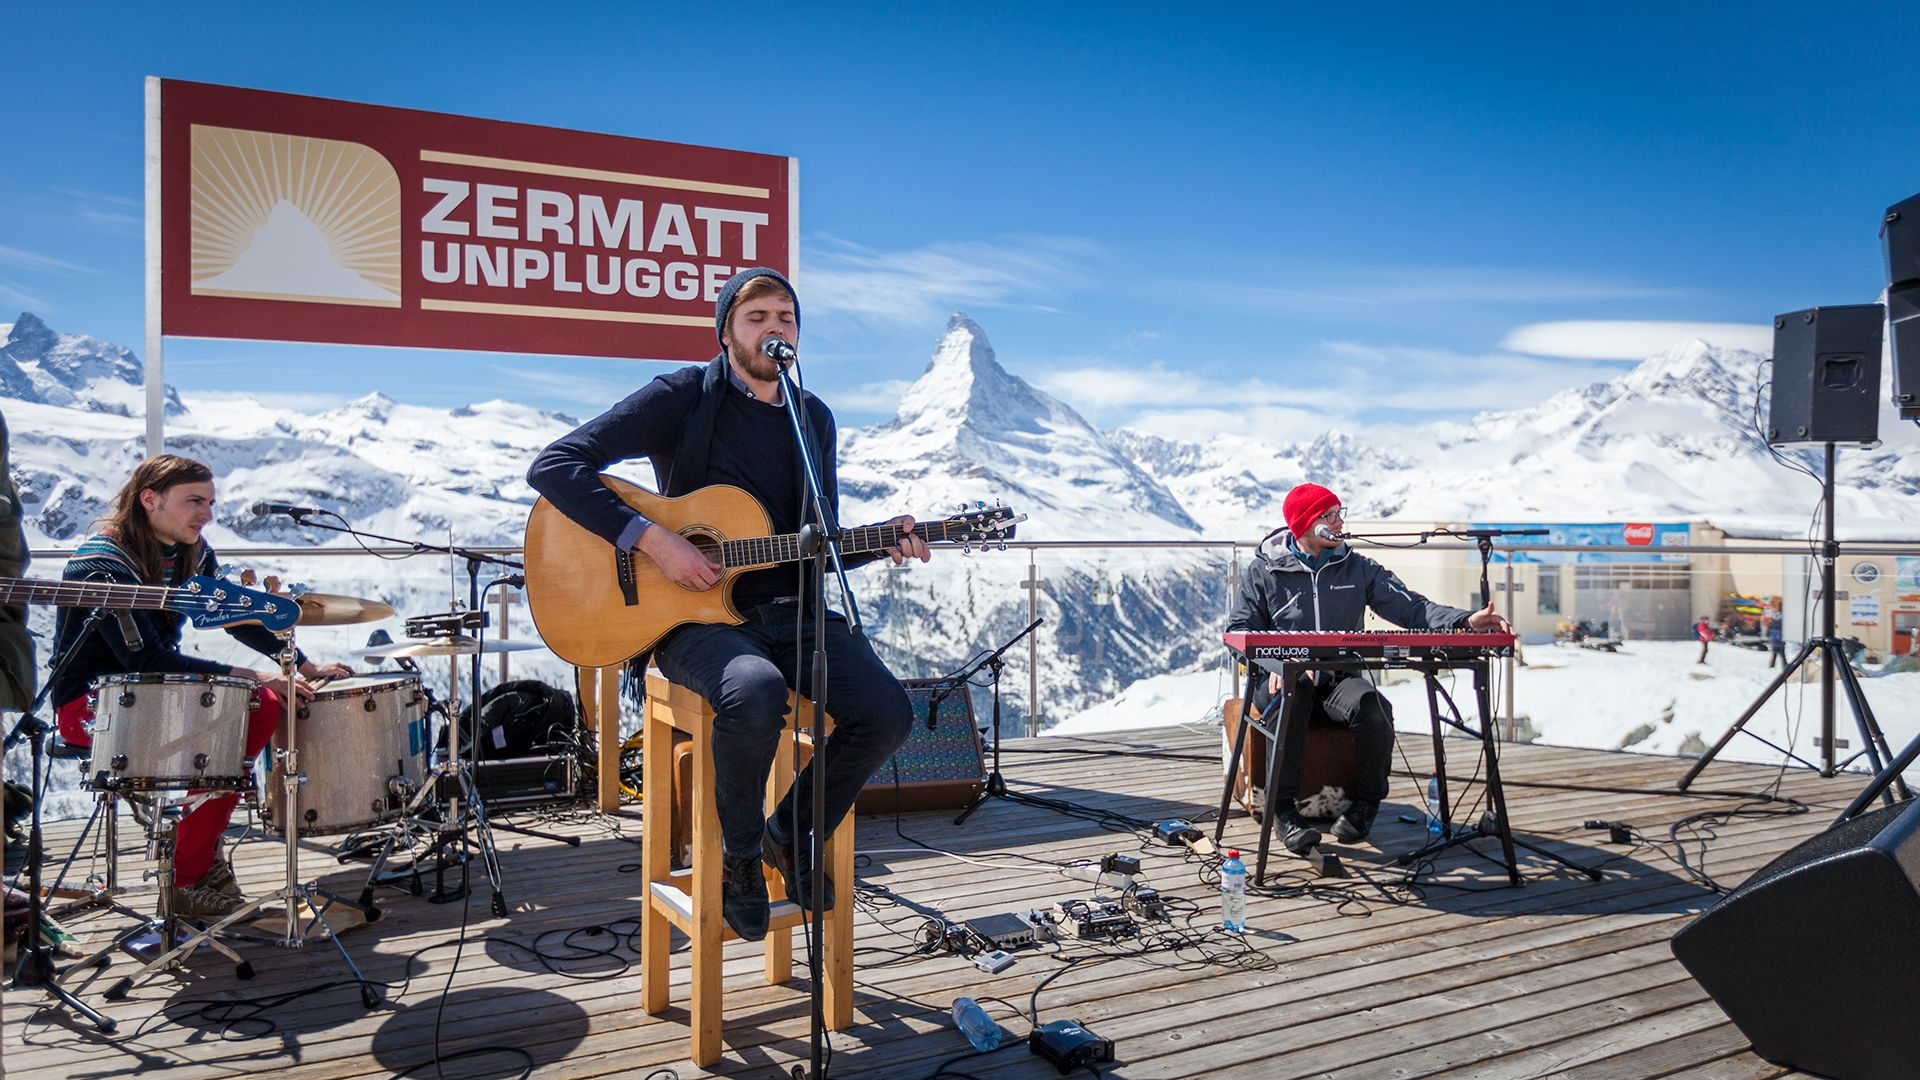 Zermatt Unplugged 2013  ...nice backdrop they say ;-)